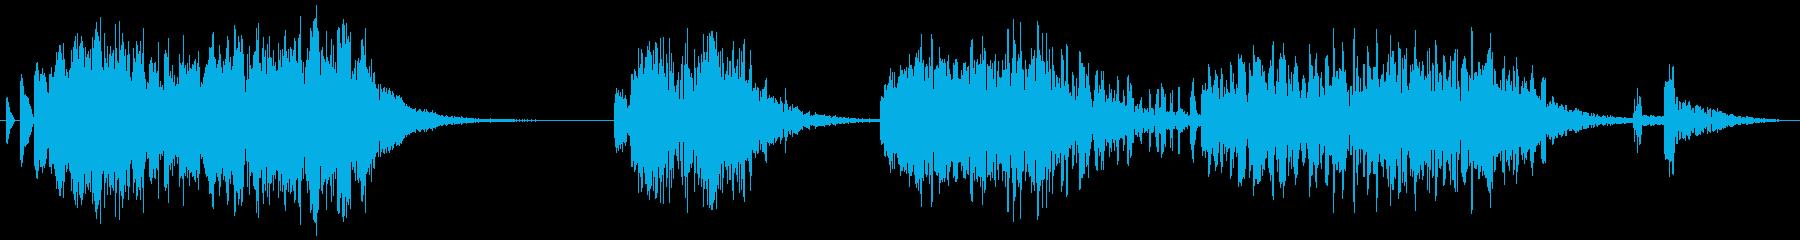 FX_62 Data Transの再生済みの波形